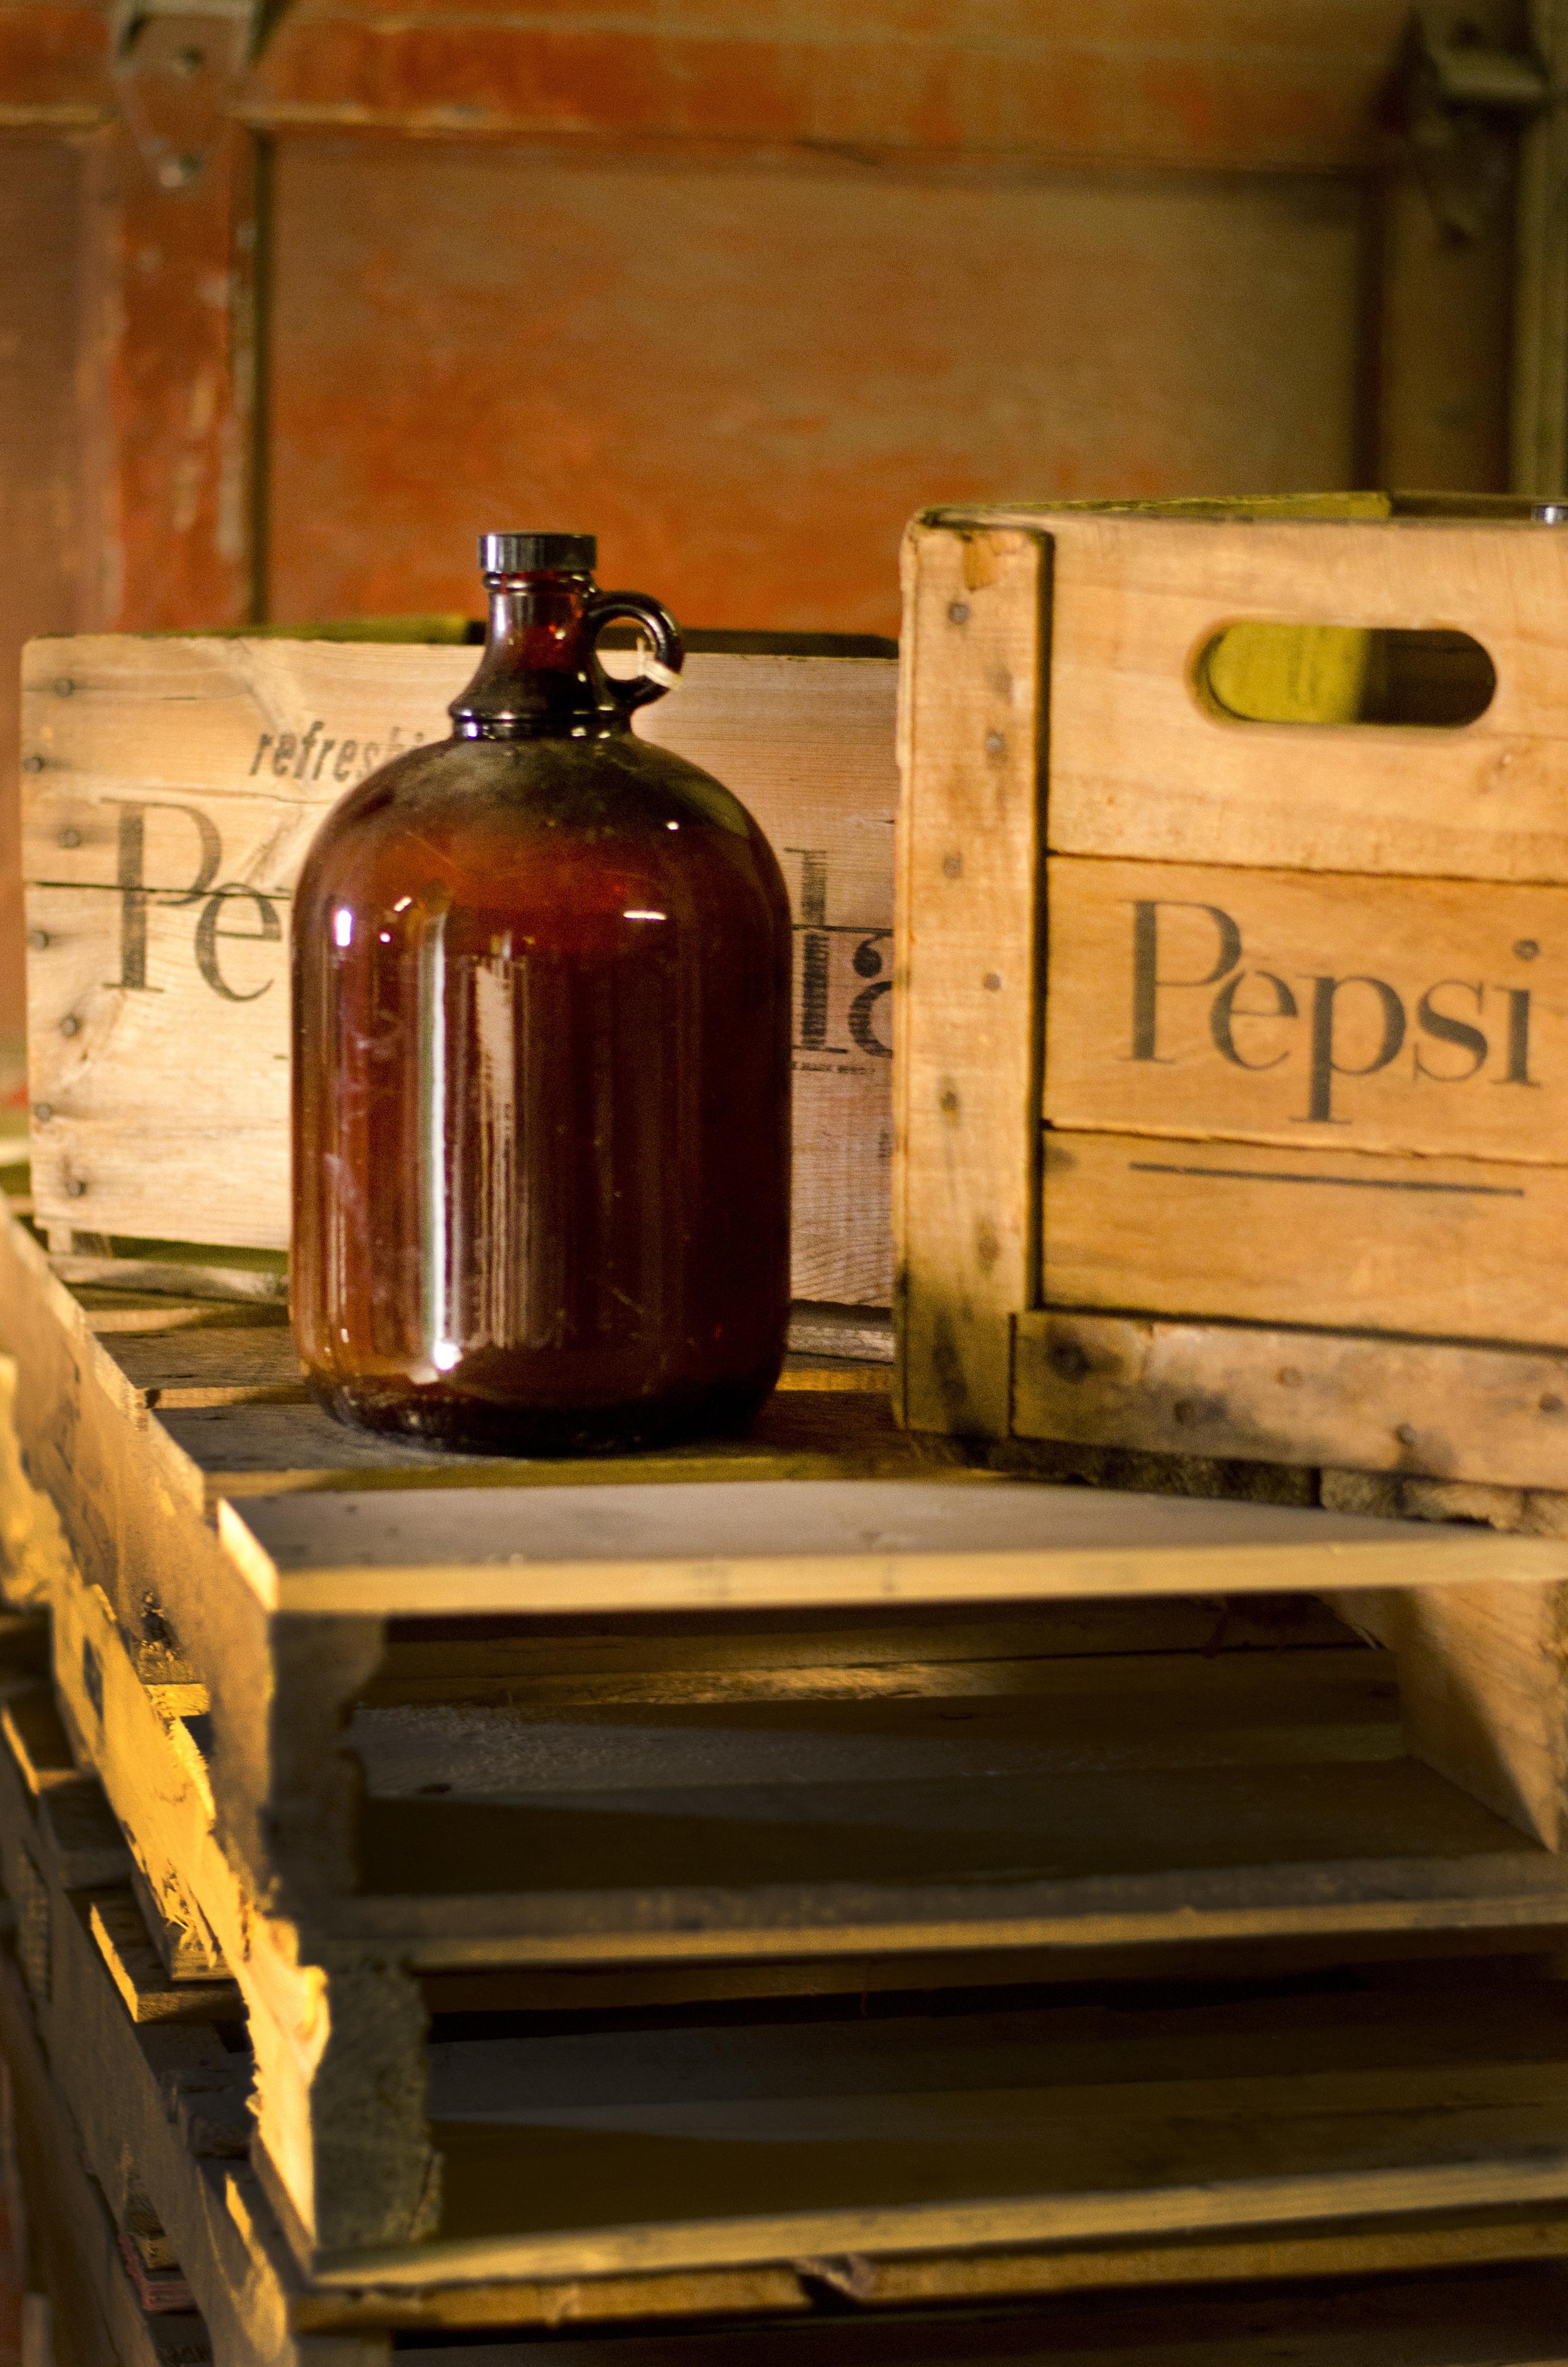 pepsi soda wooden crates